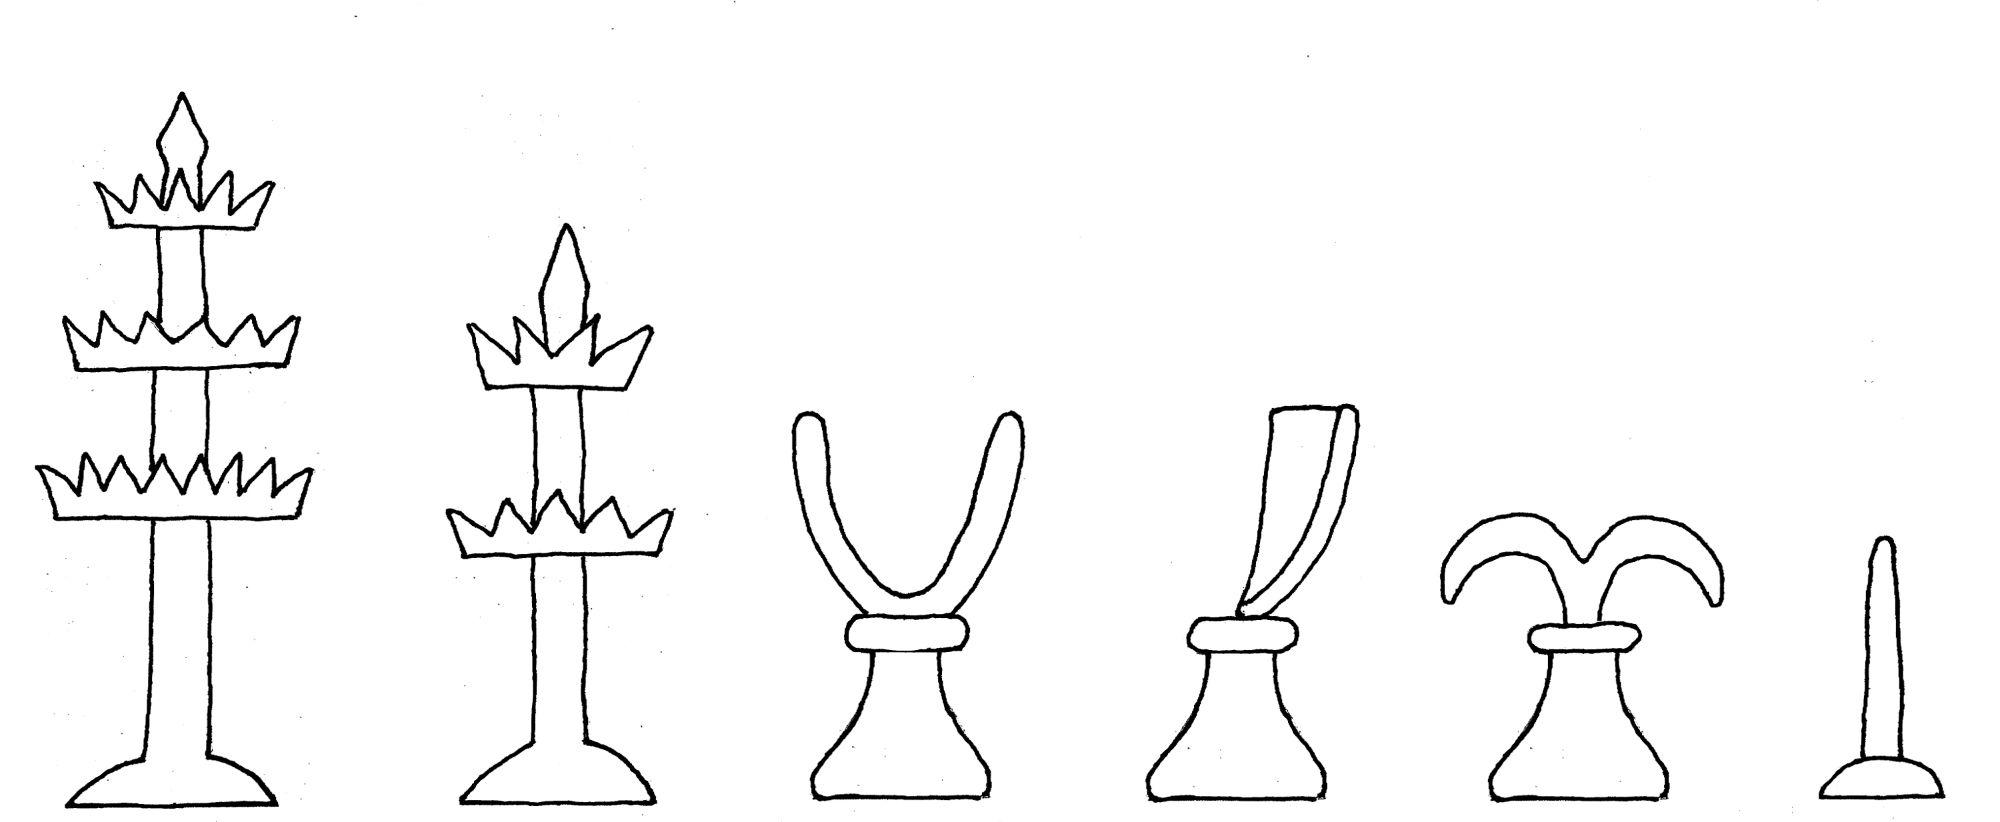 Albrecht and Anna chess set interpretive diagram